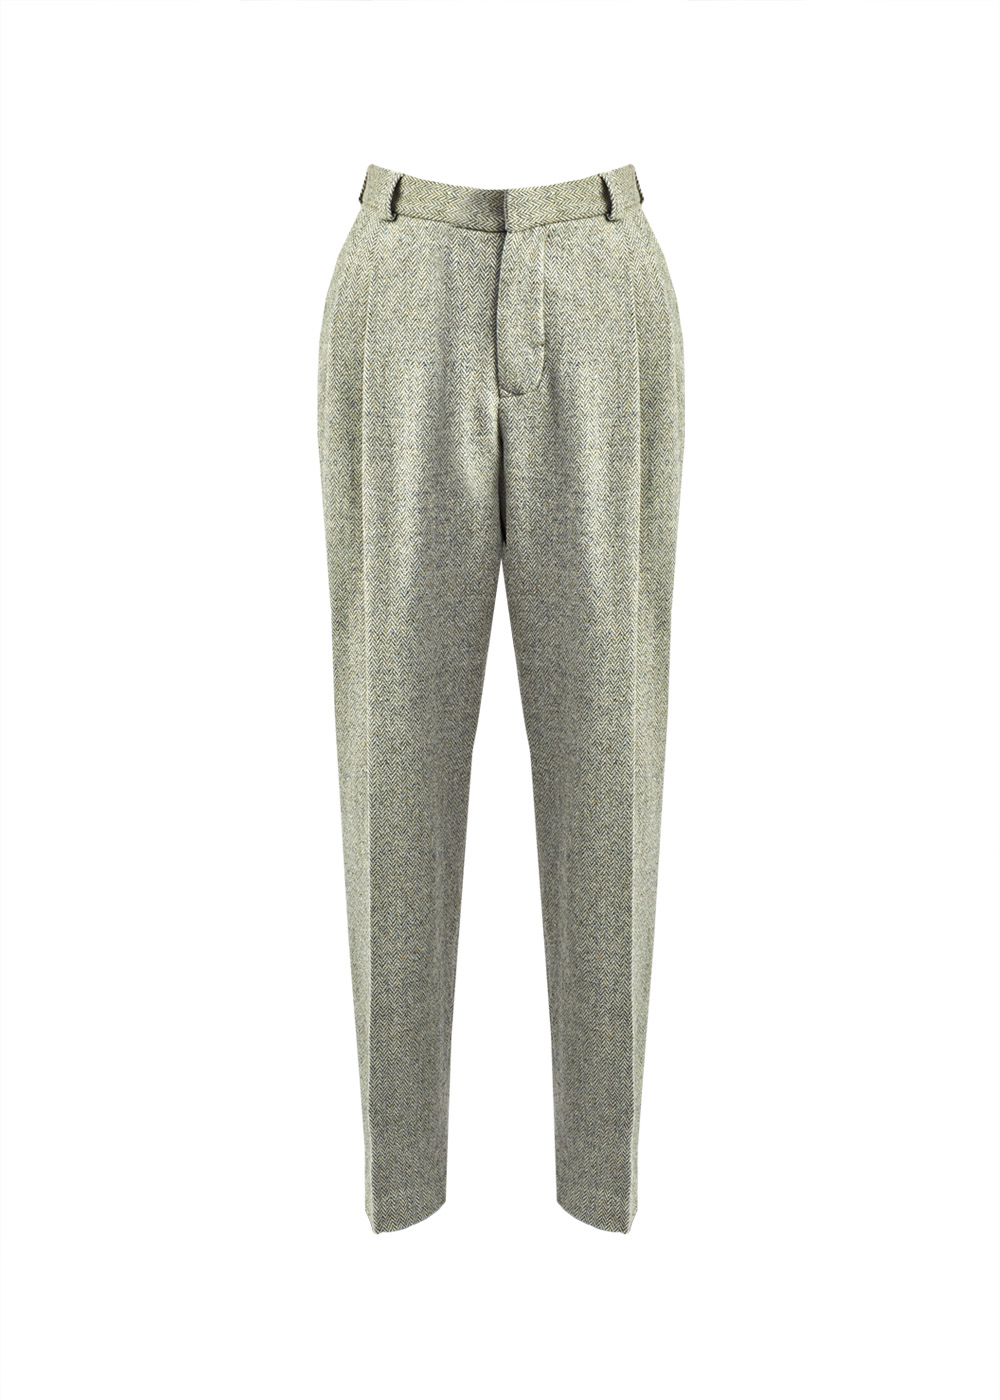 Купить NUMERONUOVO брюки